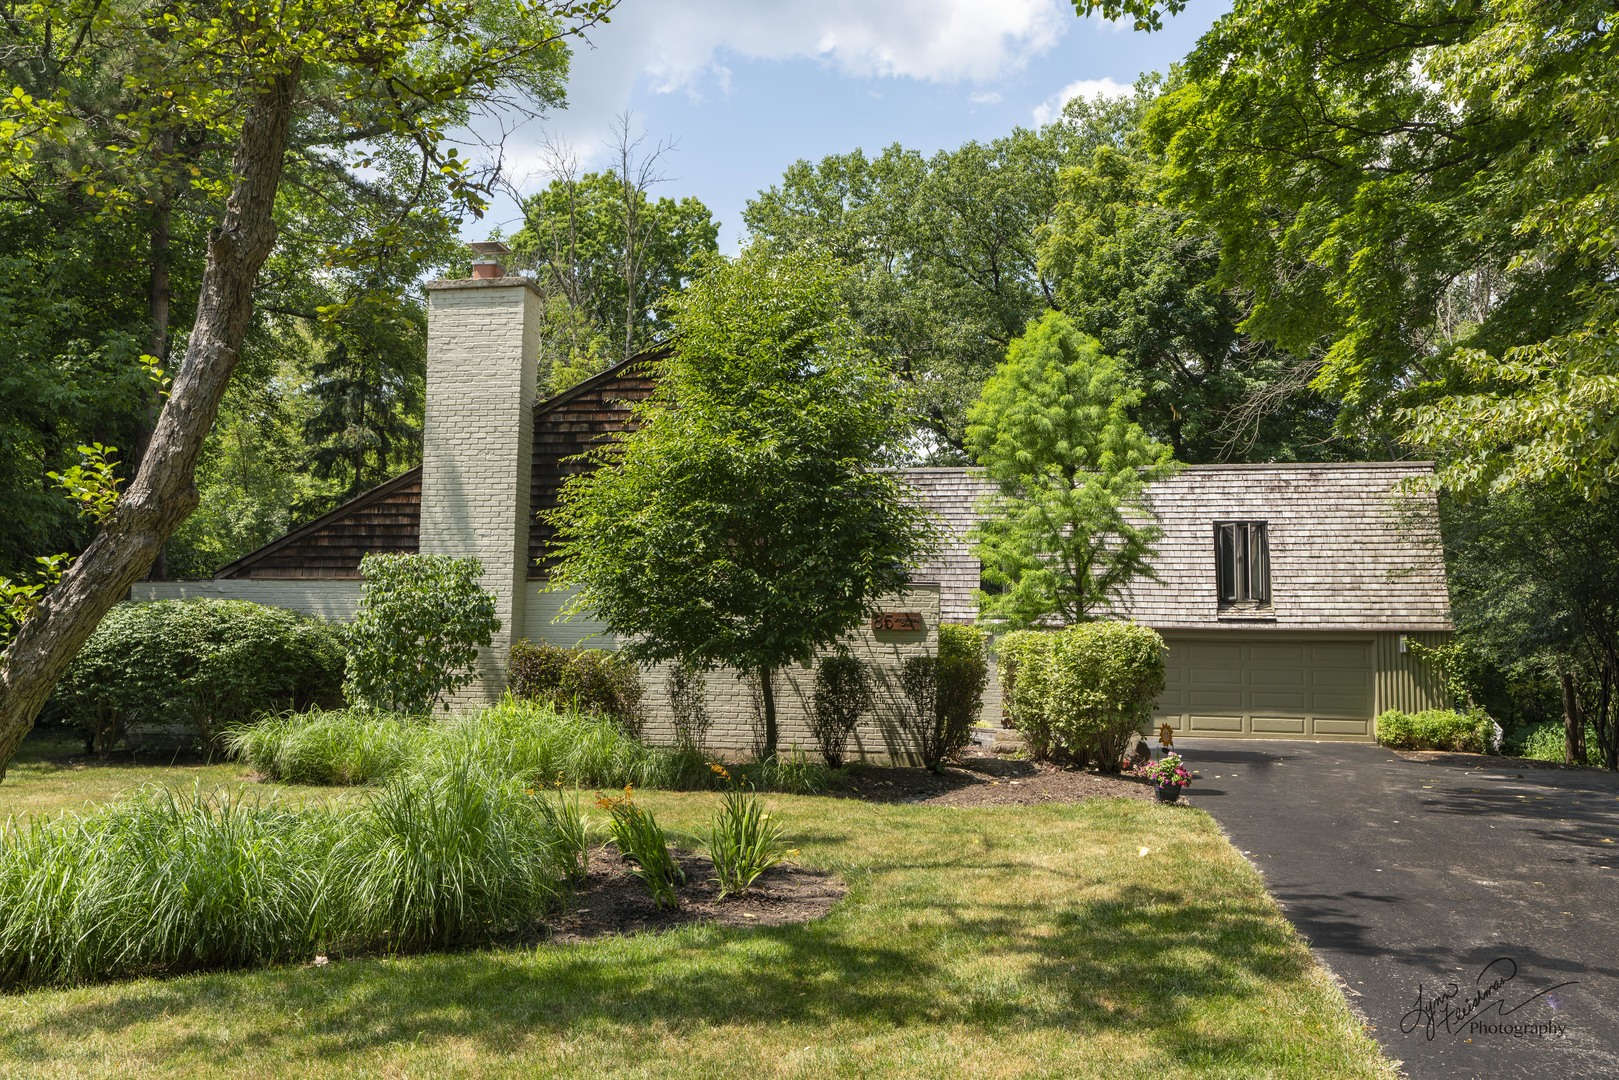 85 Lincolnshire Drive, Lincolnshire in Lake County, IL 60069 Home for Sale